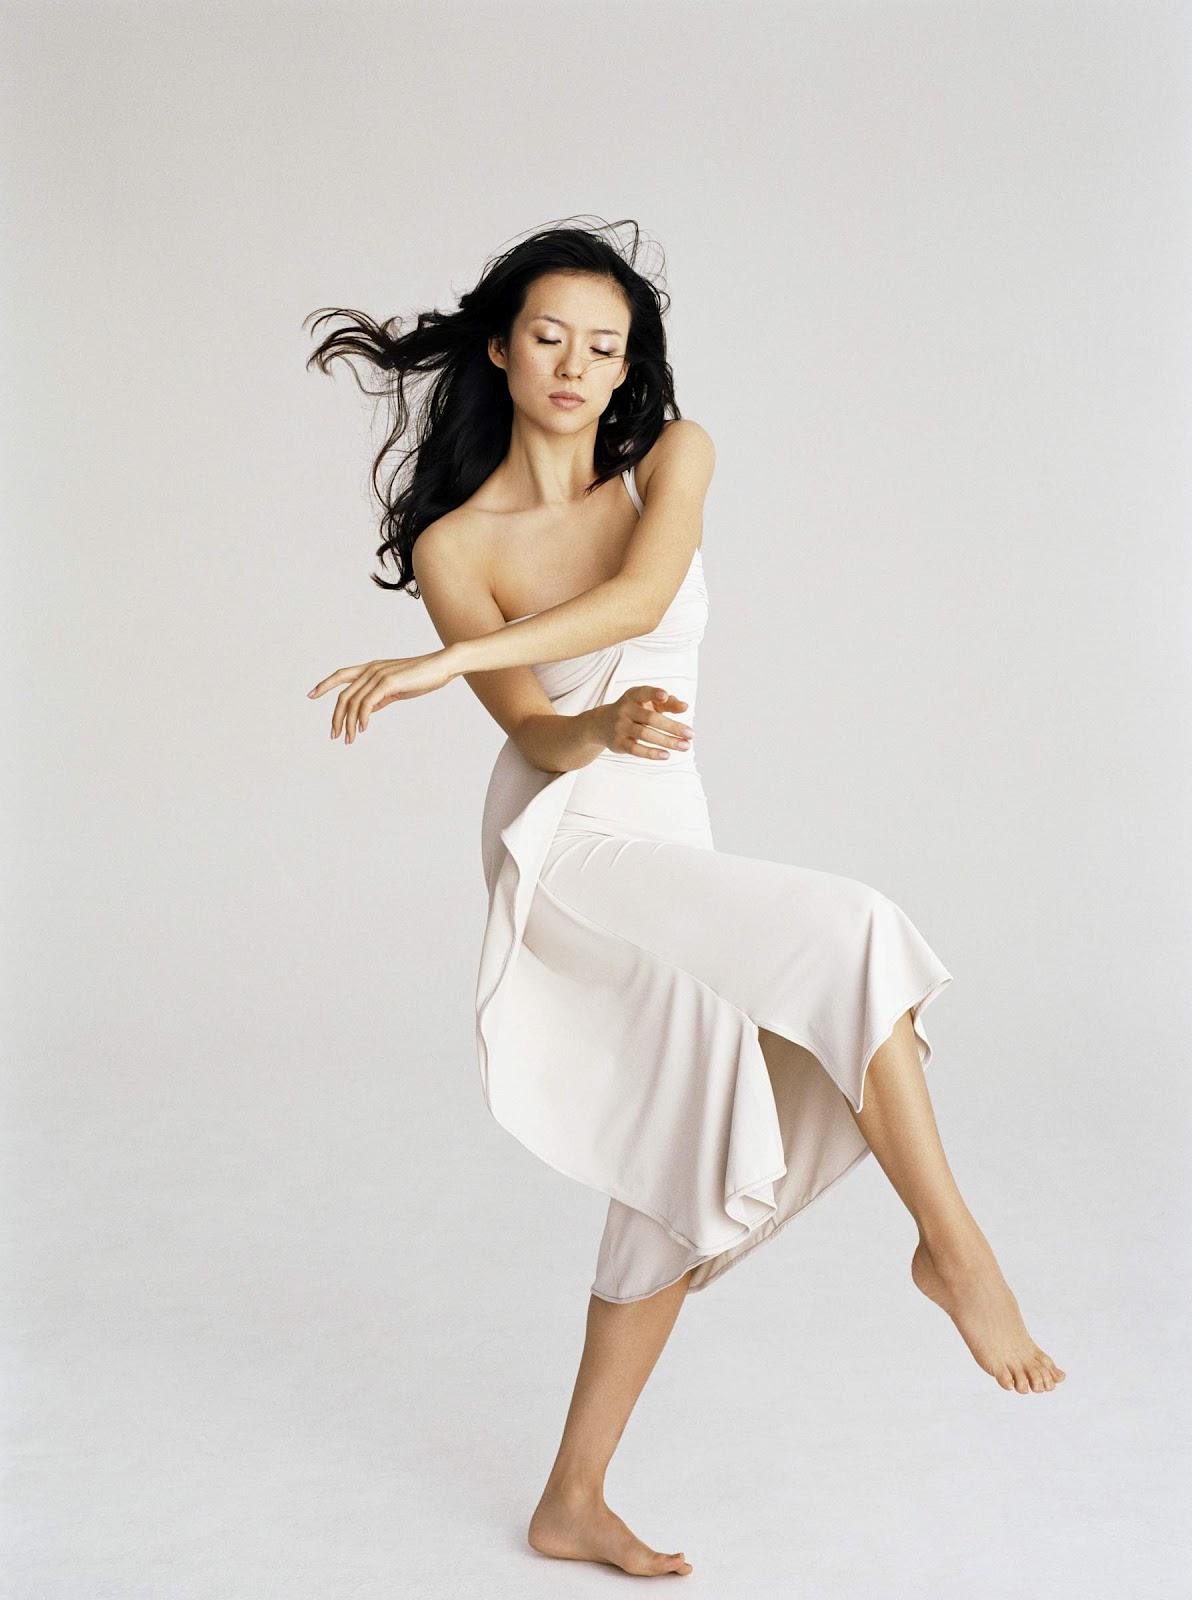 http://1.bp.blogspot.com/-lO0z7QsS10U/T2CEtUFFAbI/AAAAAAAABec/TIdxE64Q5lQ/s1600/Zhang+Ziyi+13.jpg